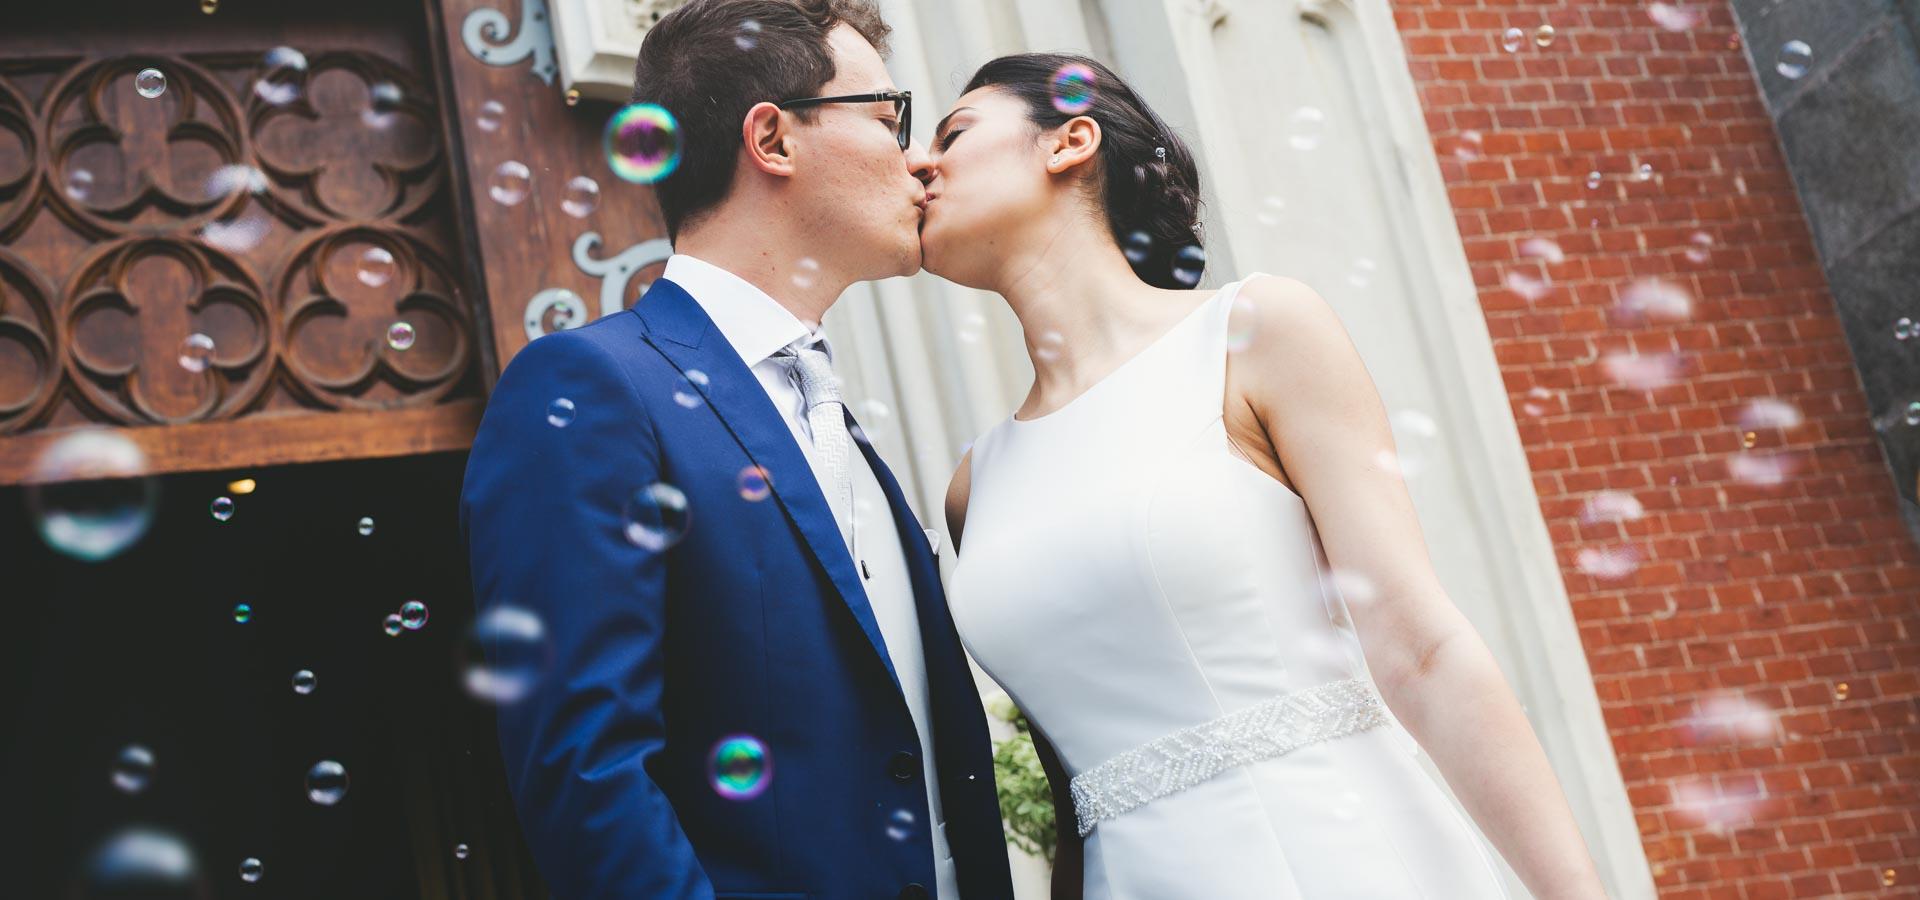 lucia-e-gianluca-festeggiano-matrimonio-tra-le-bolle